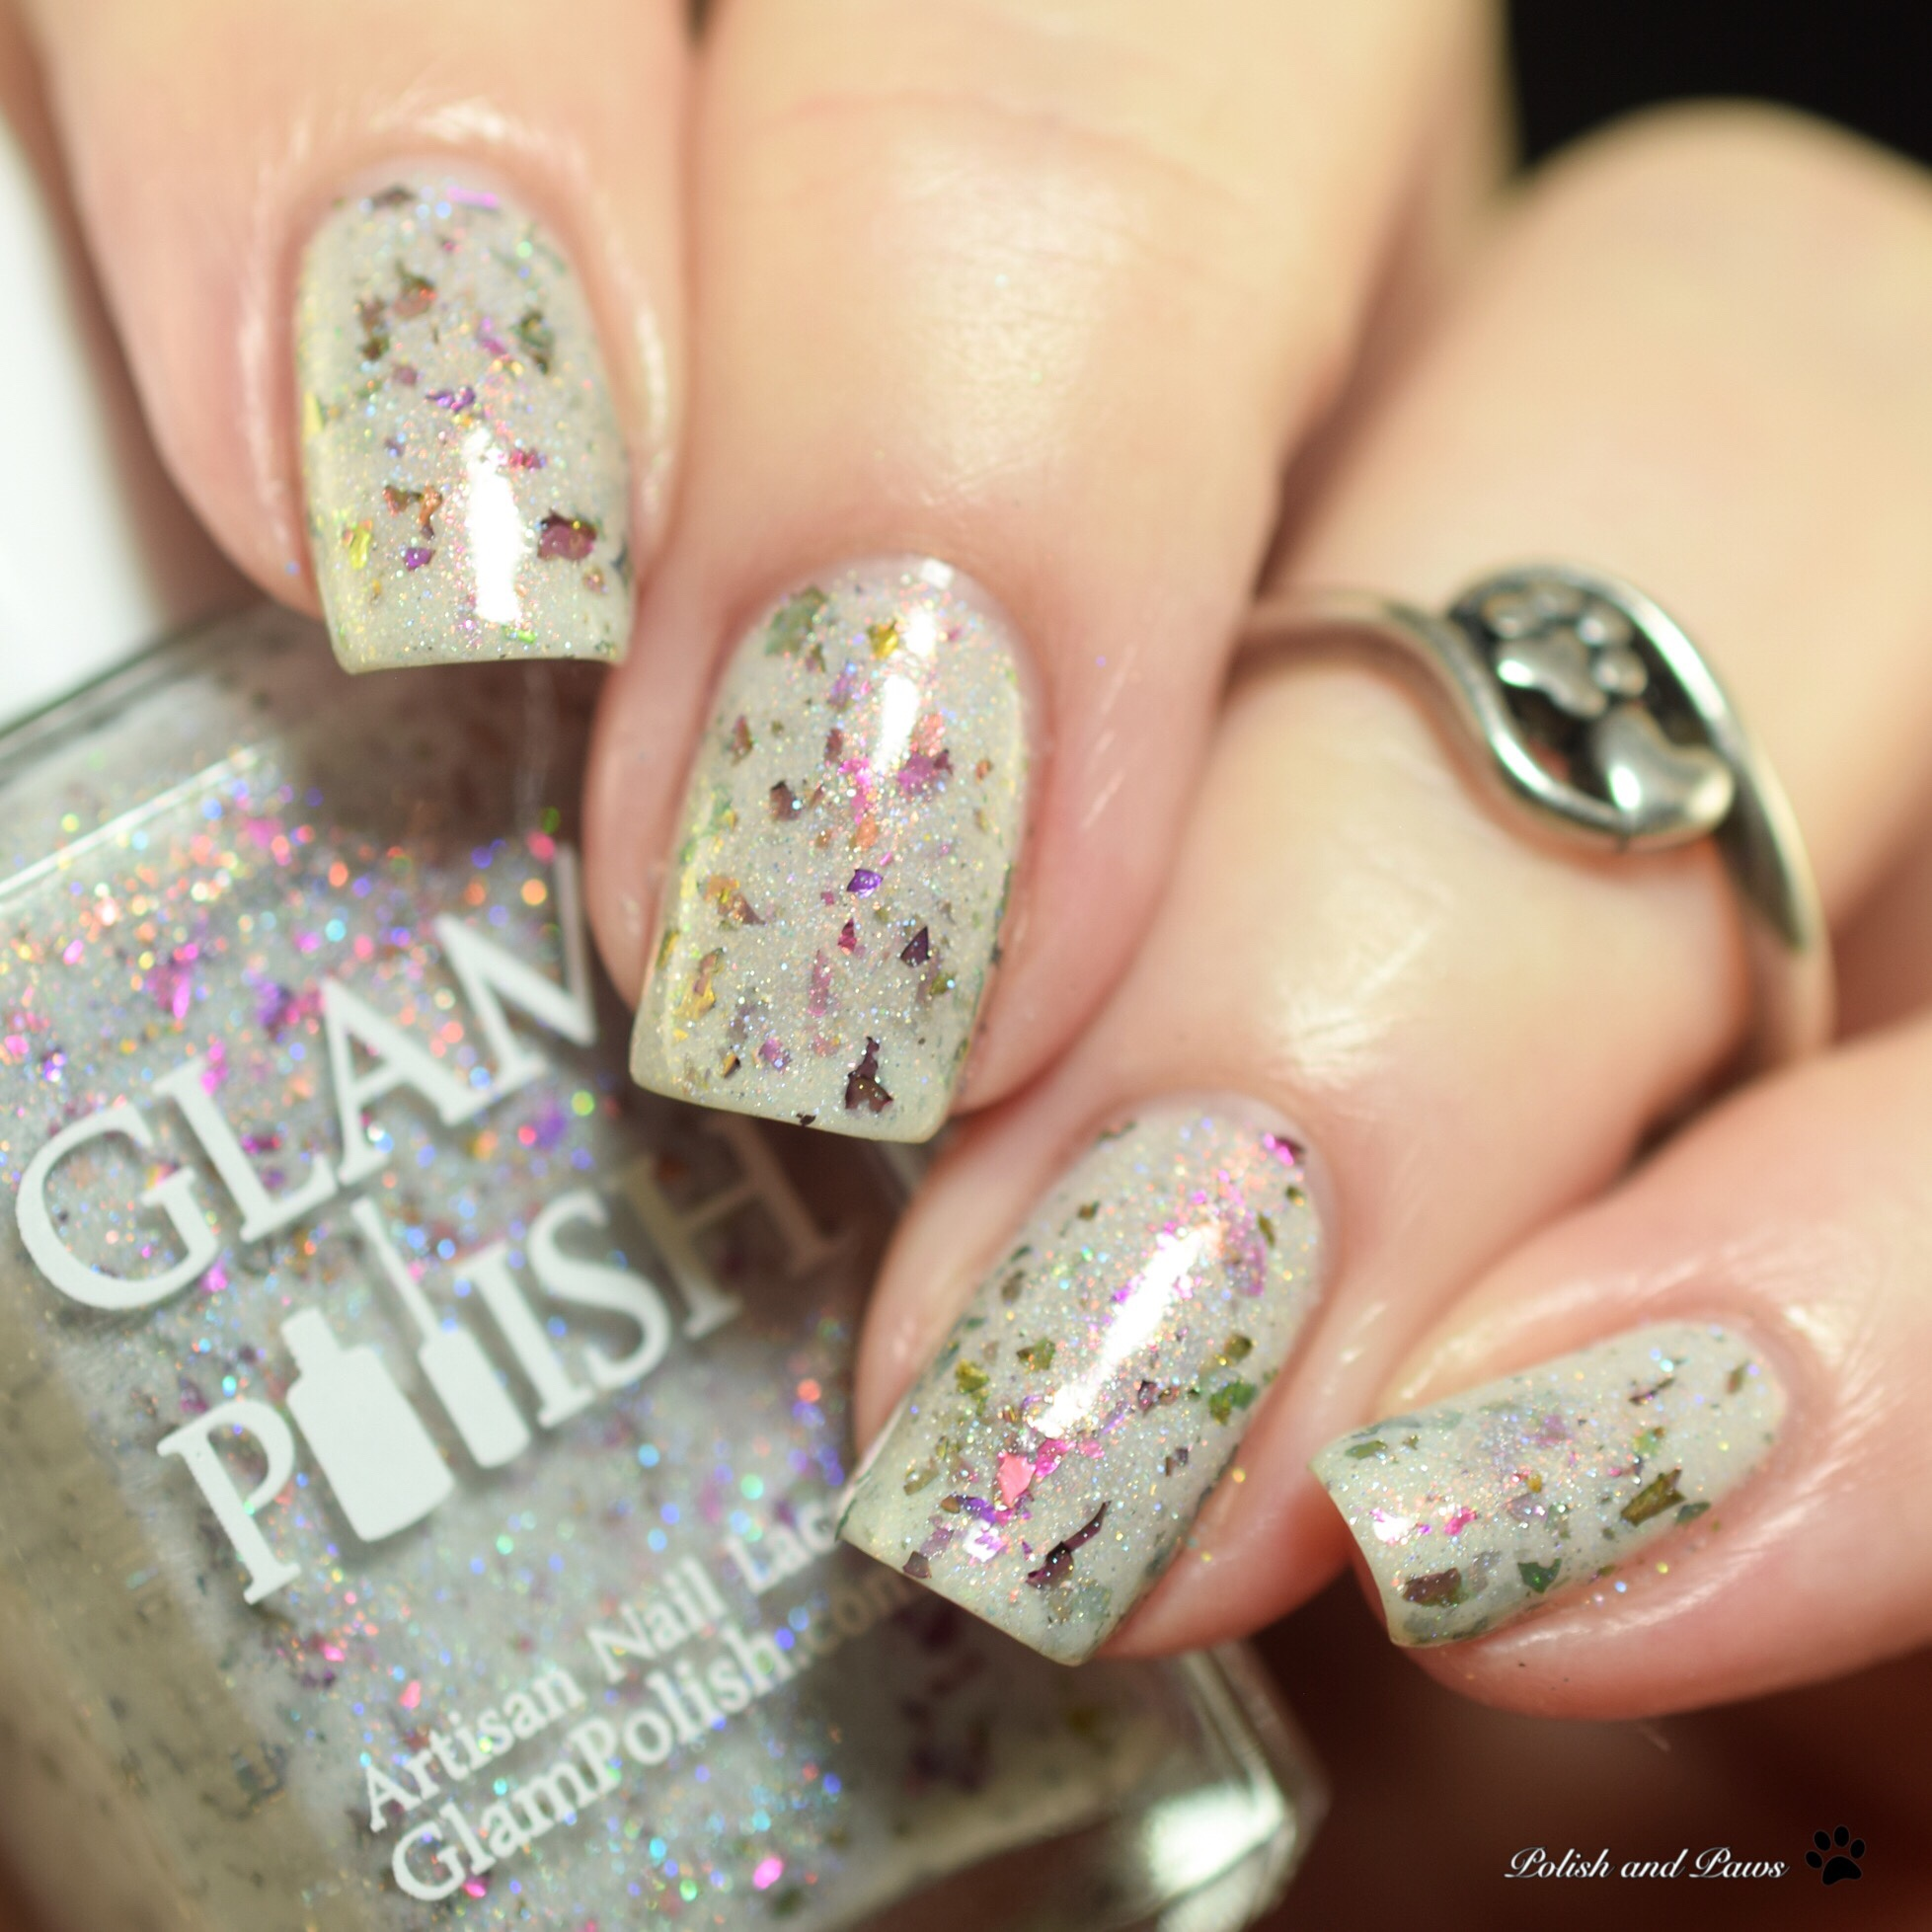 Glam Polish Wizarding War